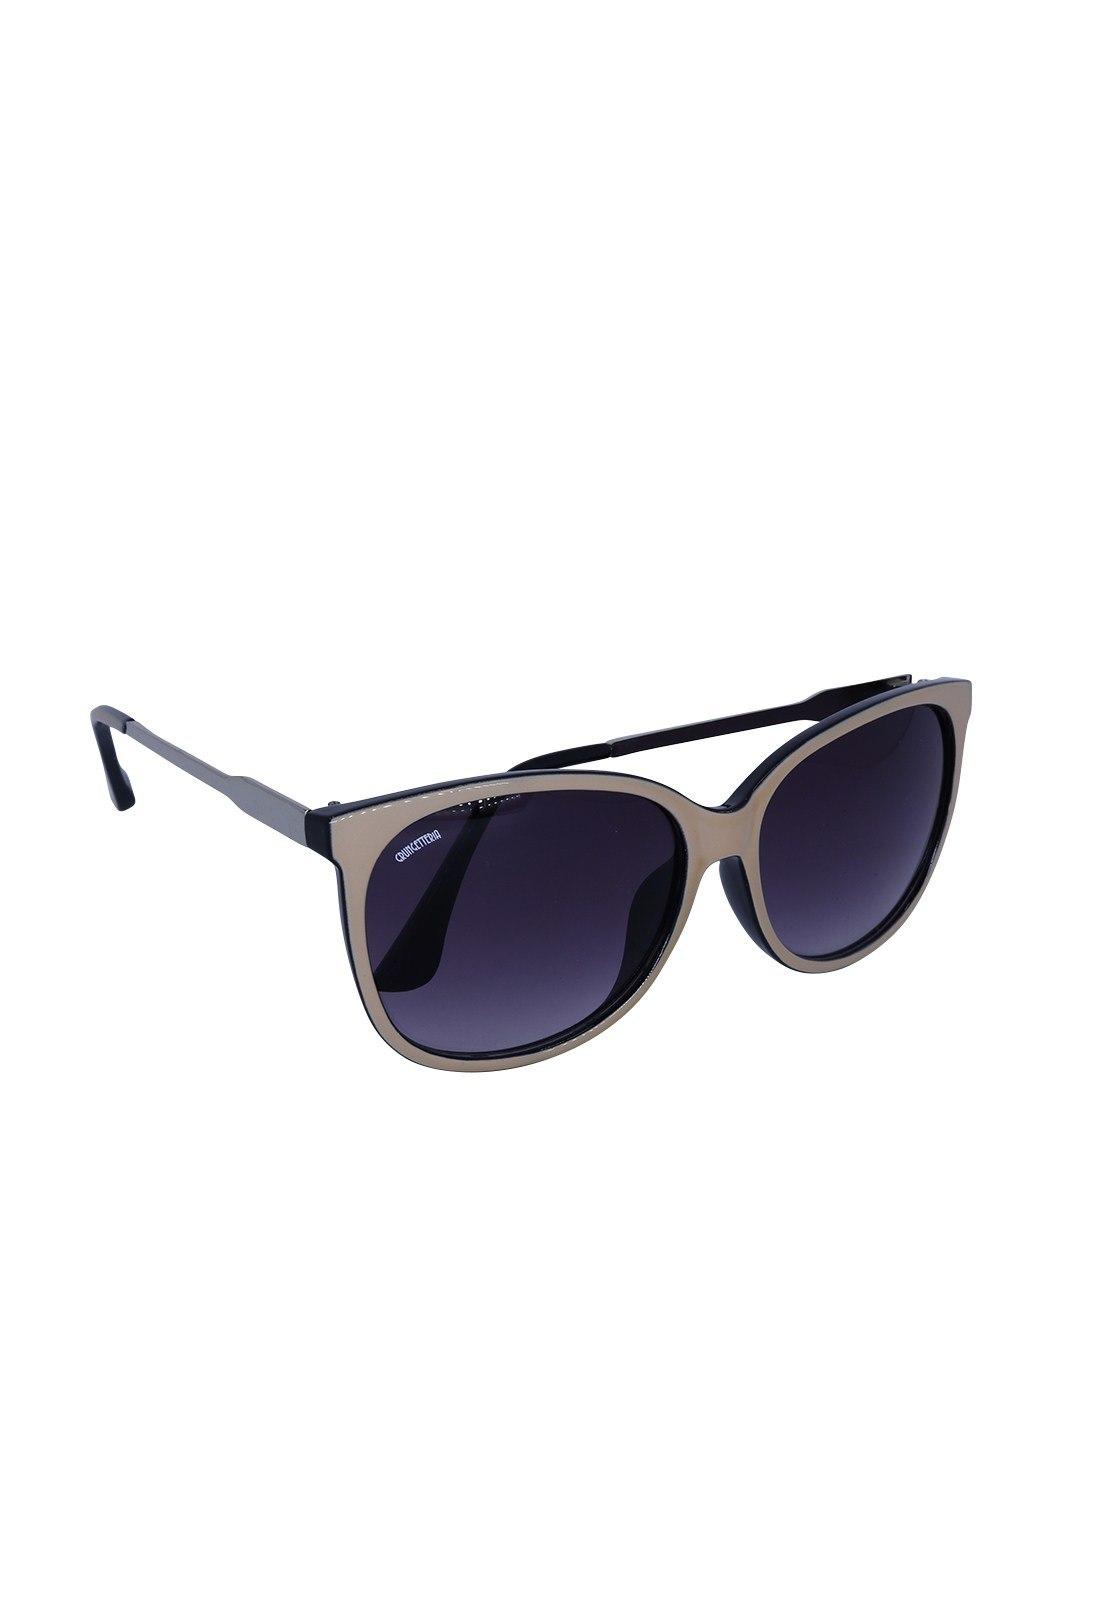 Óculos de Sol Grungetteria Beetle Bege